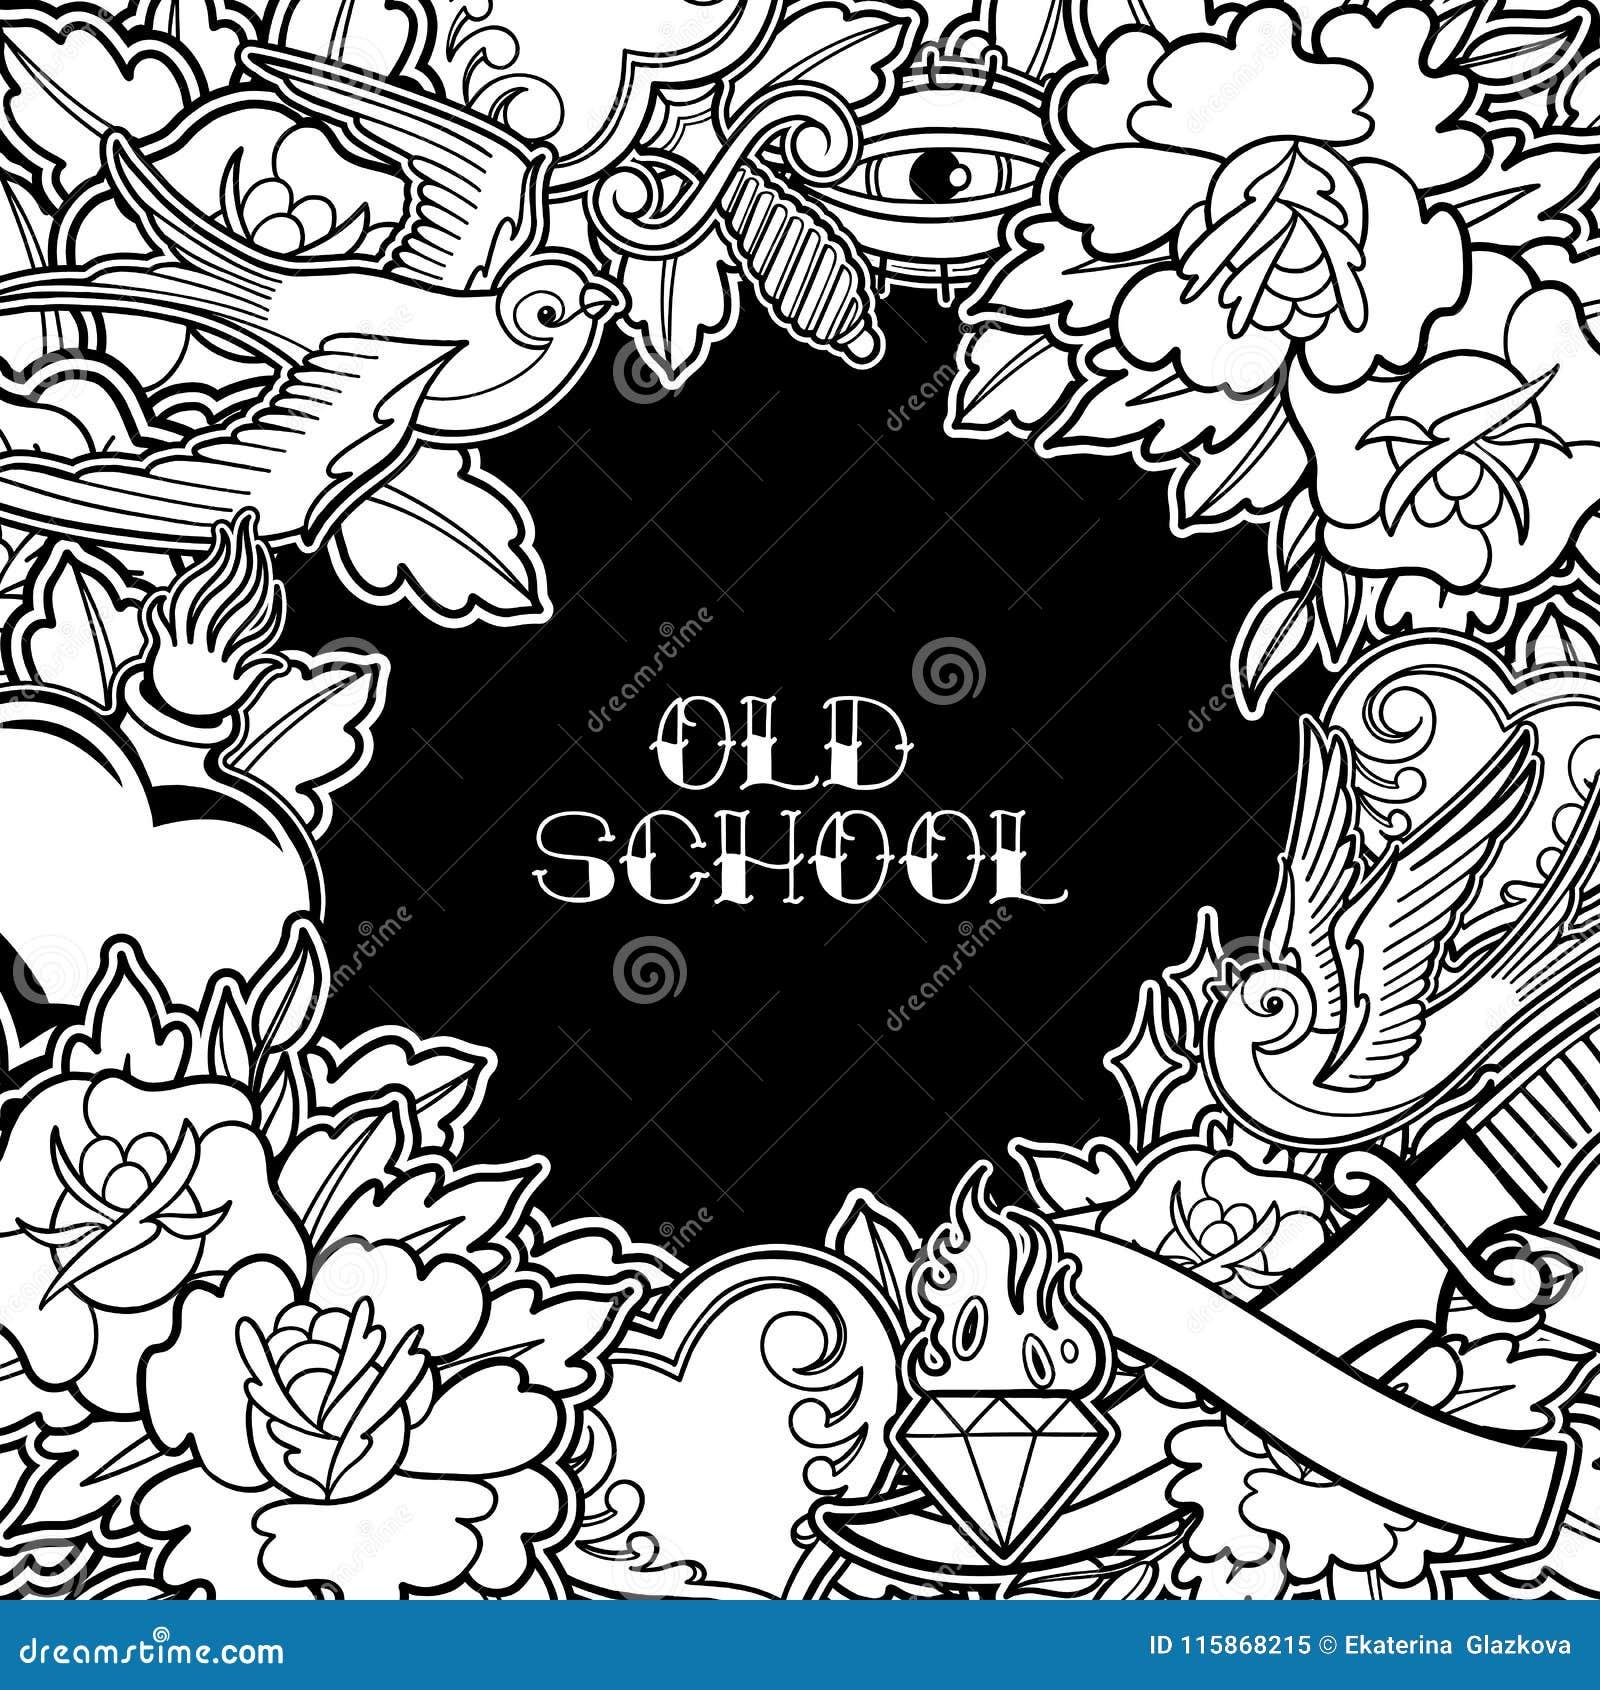 Graphic Old School Design Stock Vector Illustration Of Fashion